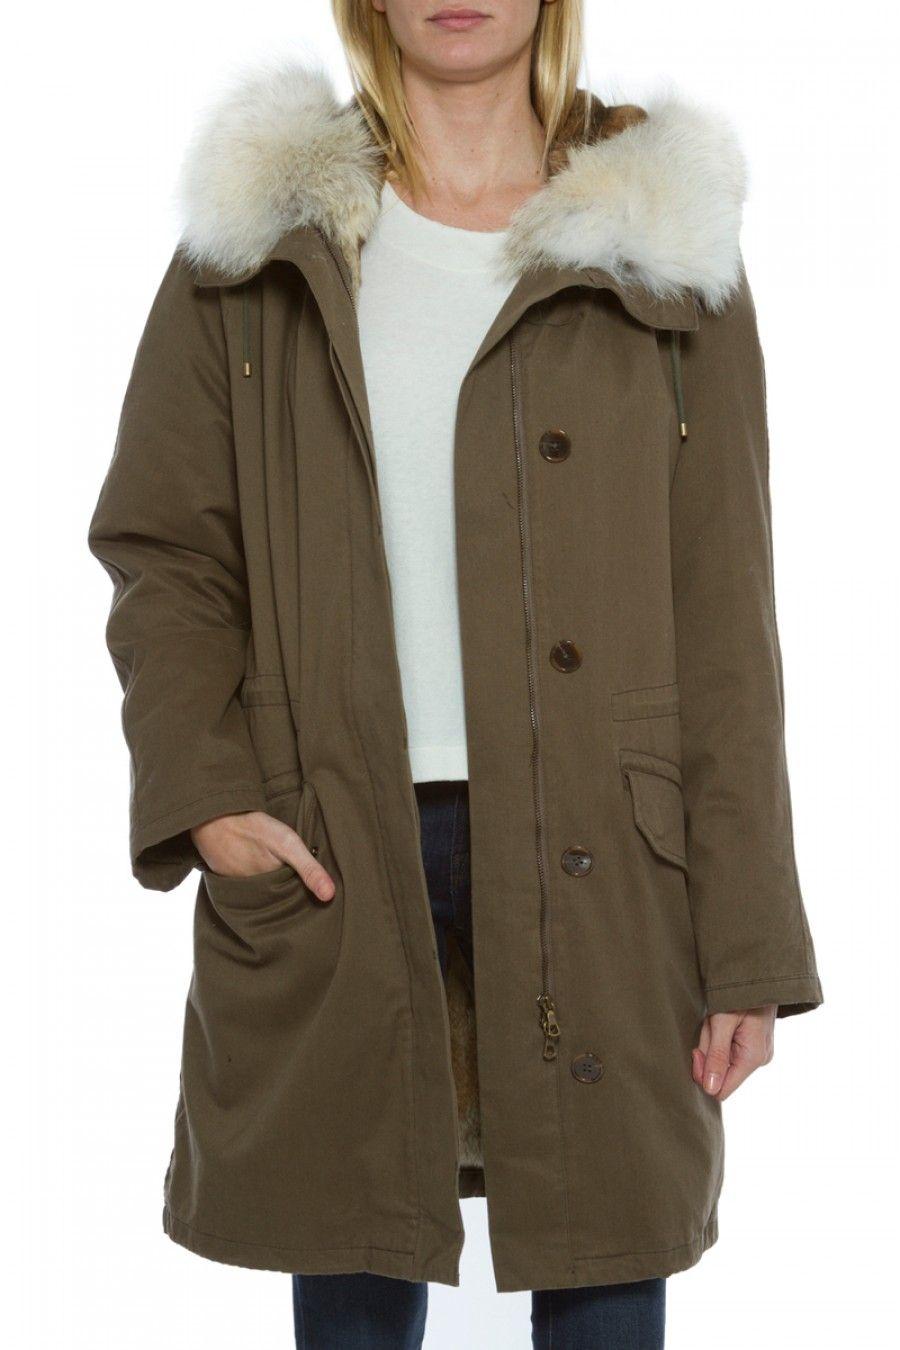 bf91601f67e4 ARMY BY YVES SALOMON Rabbit Fur Lined Parka.  armybyyvessalomon  cloth